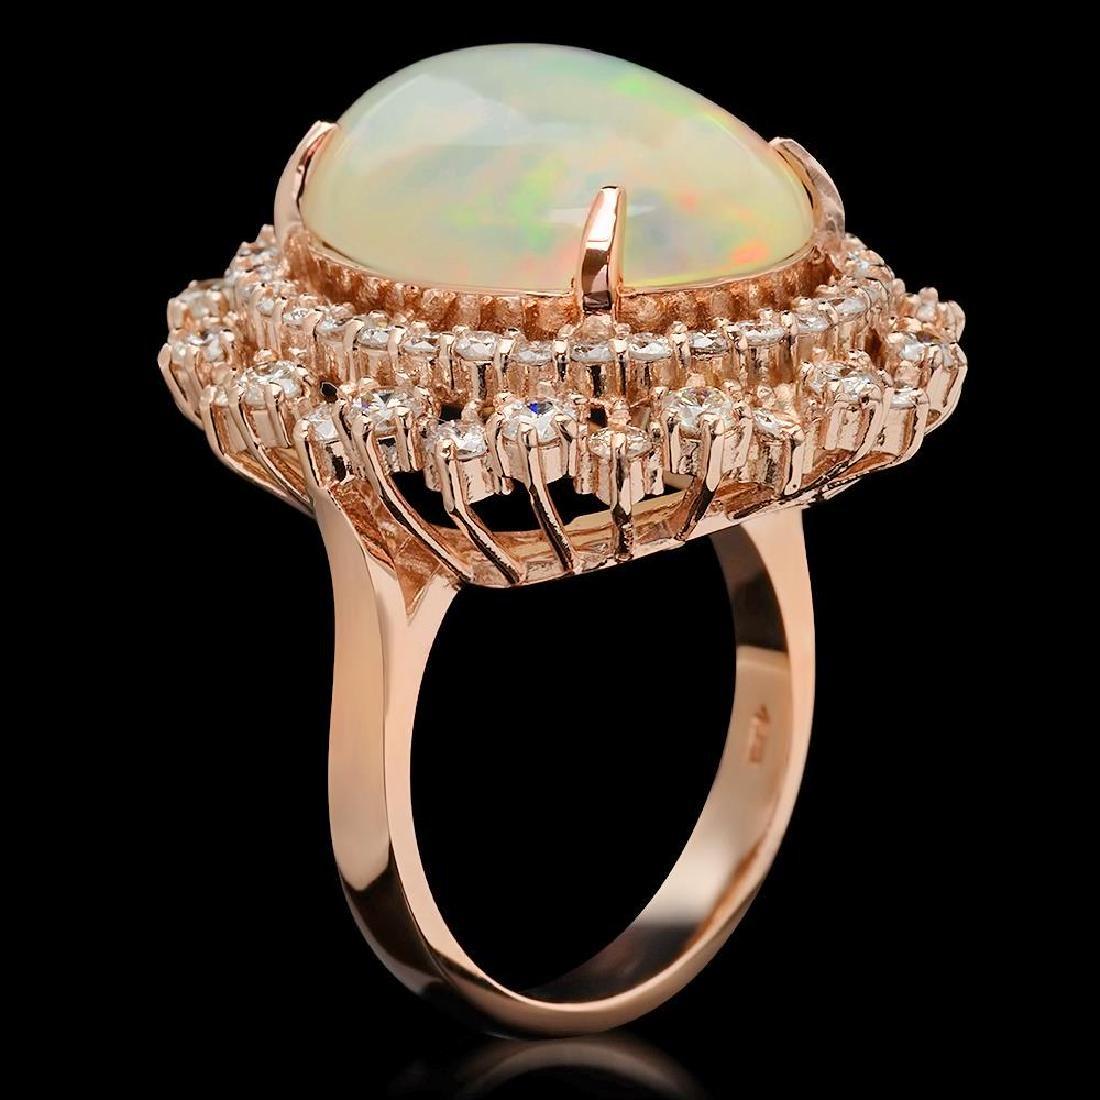 14K Gold 7.38ct Opal & 2.12ct Diamond Ring - 2